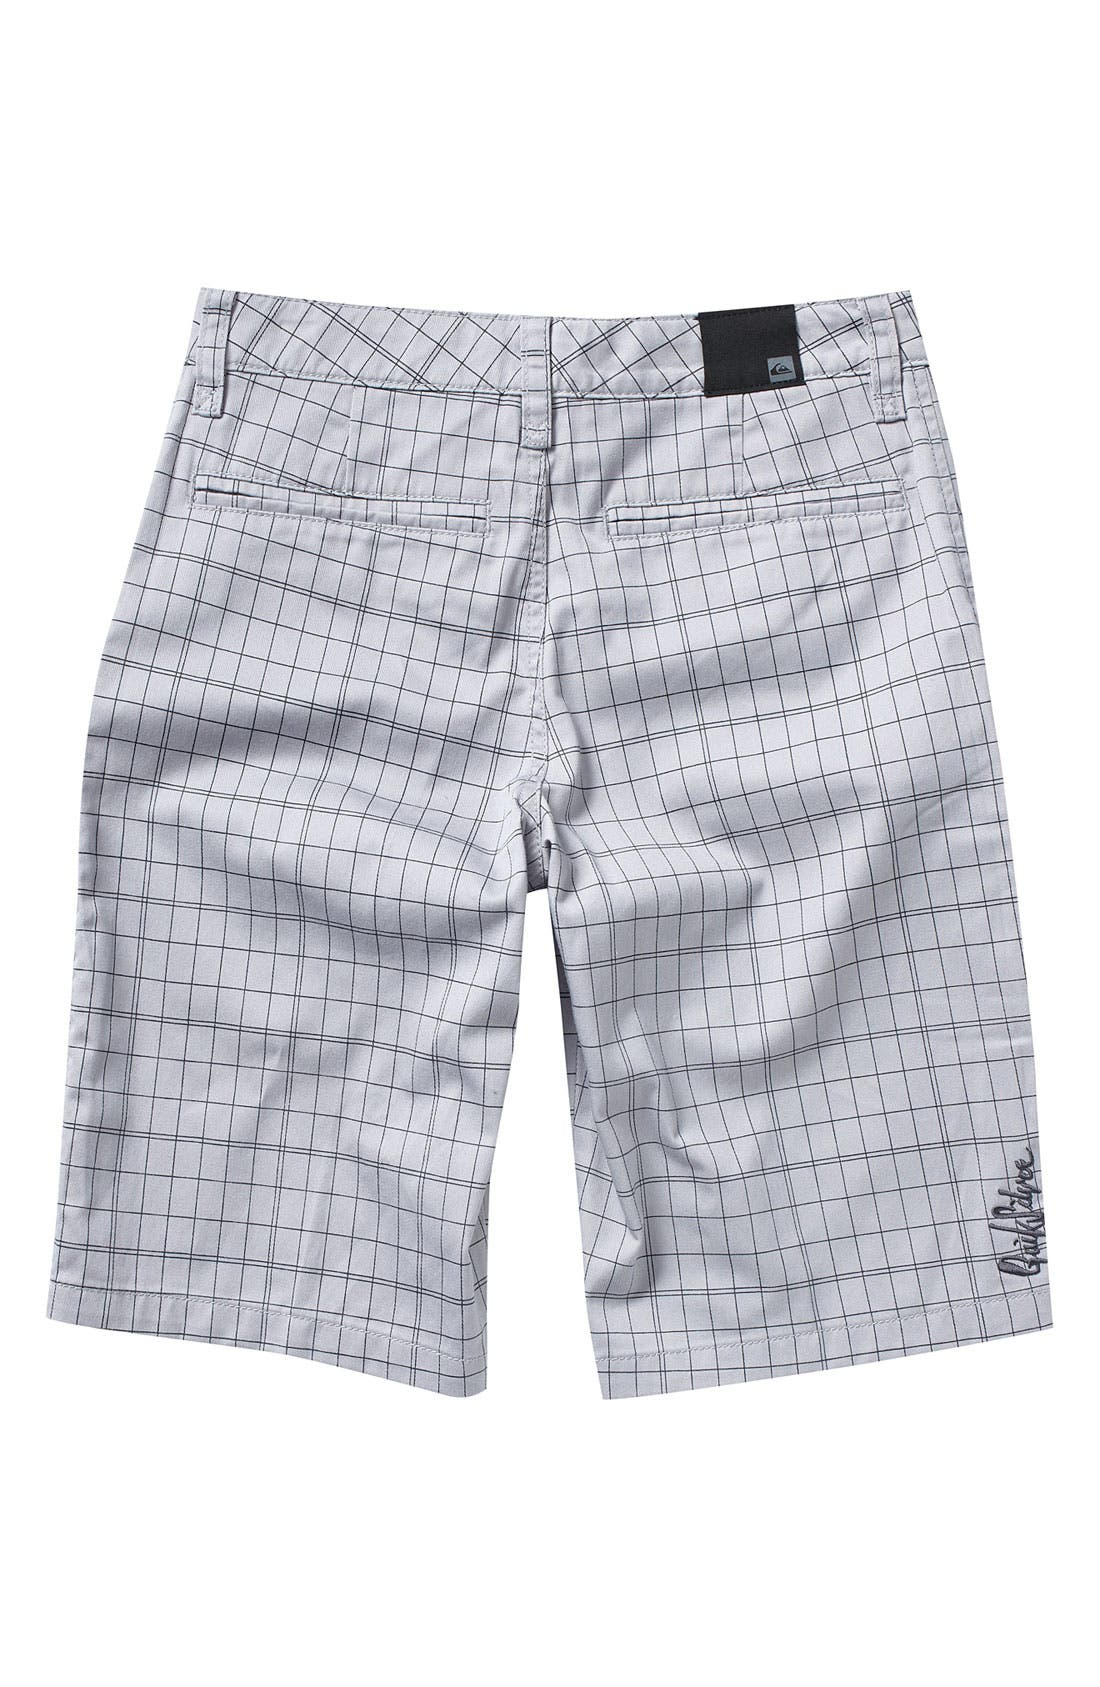 Alternate Image 2  - Quiksilver 'Nuno' Shorts (Little Boys)